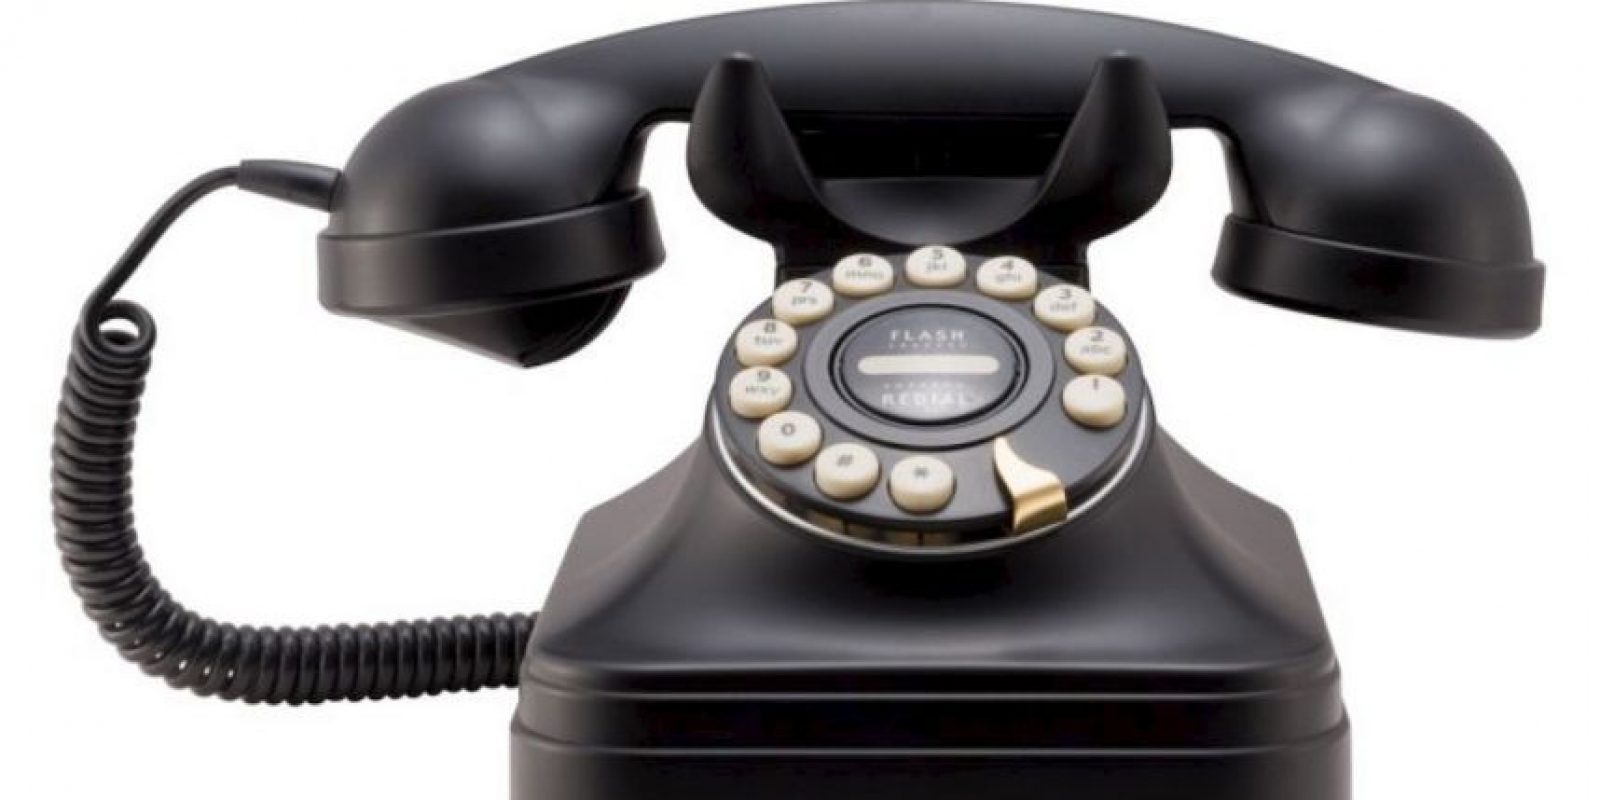 2. Un muerto llama por teléfono Foto:Wikimedia